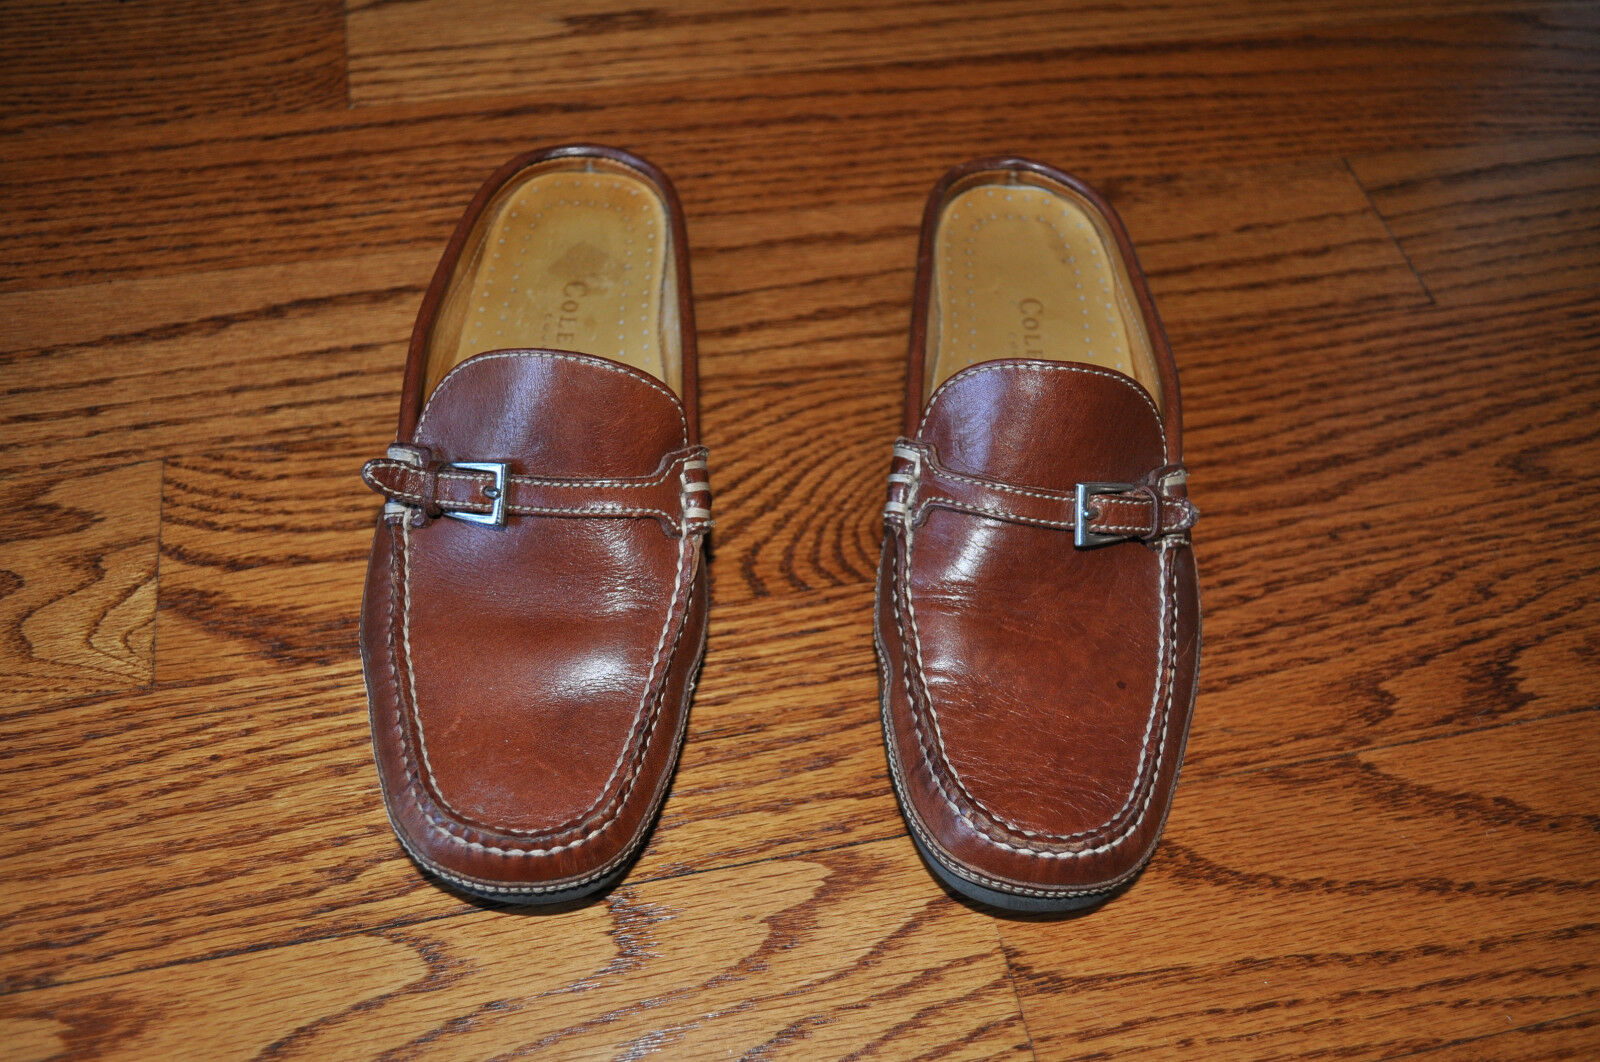 NWOT   Damenschuhe COLE HAAN Braun Leder Schuhes Größe 5.5 M MADE IN BRAZIL